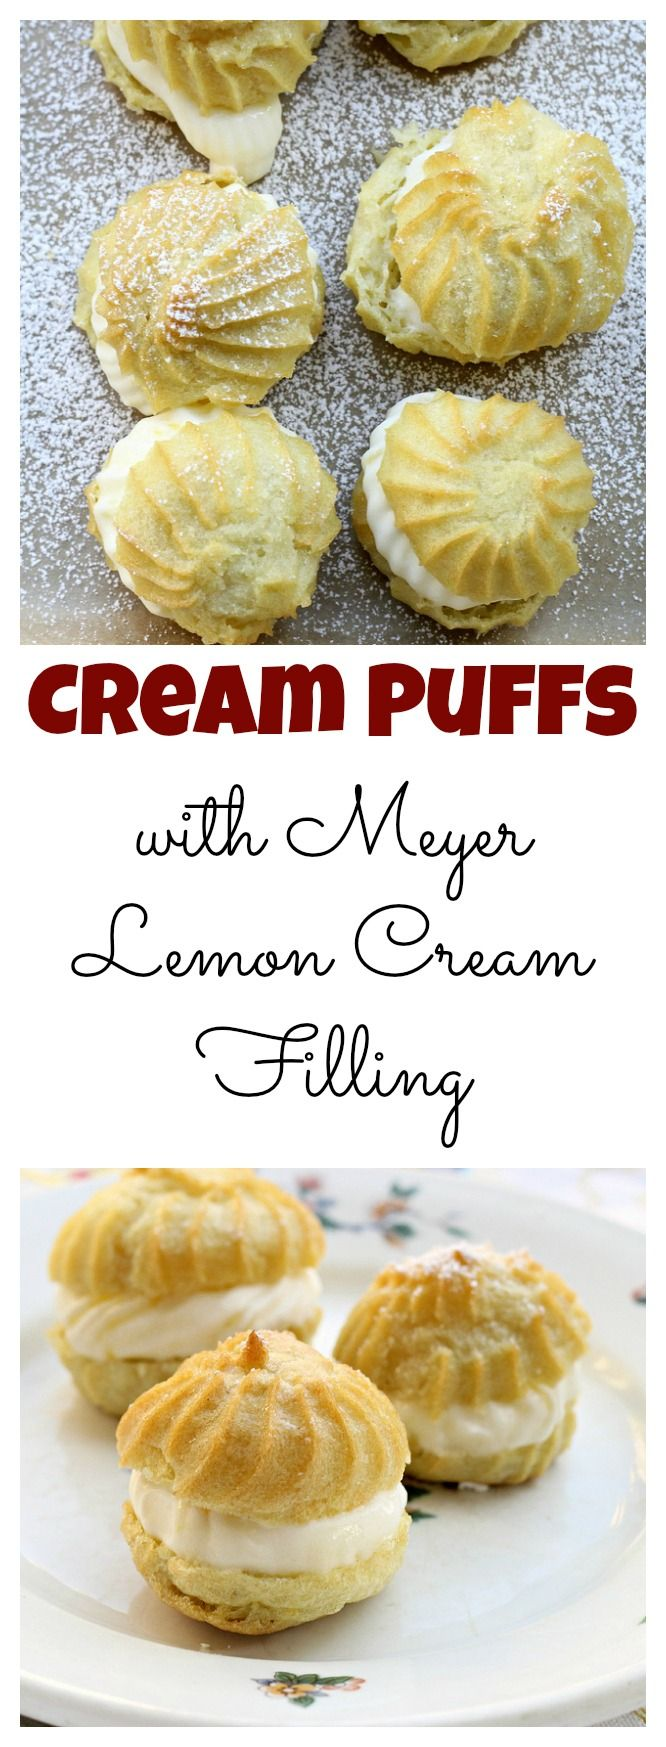 Cream Puffs with Meyer Lemon Cream Filling